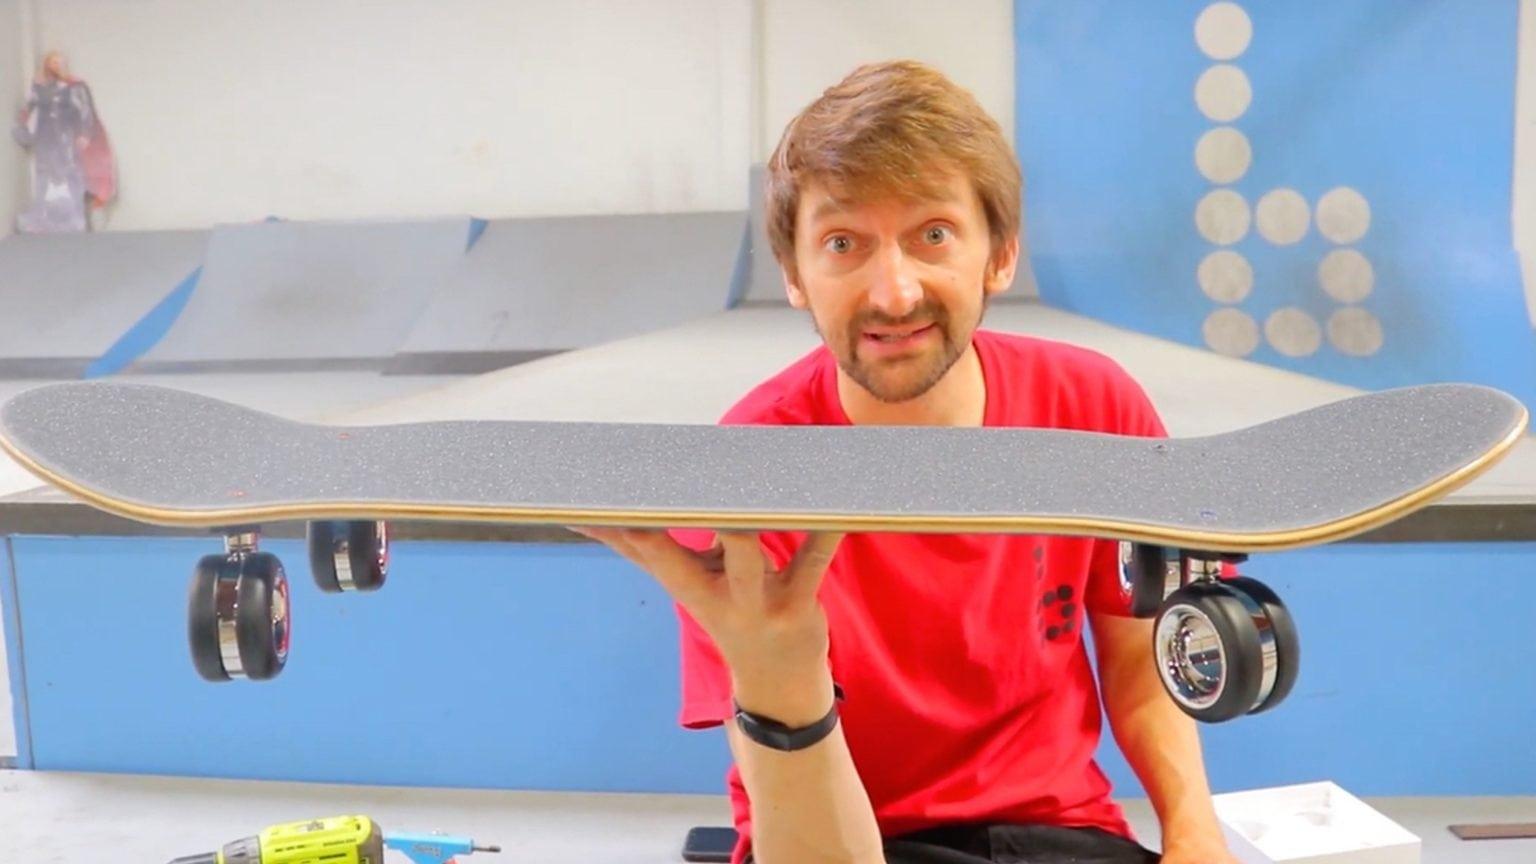 Mac Pro wheels don't make a great skateboard.